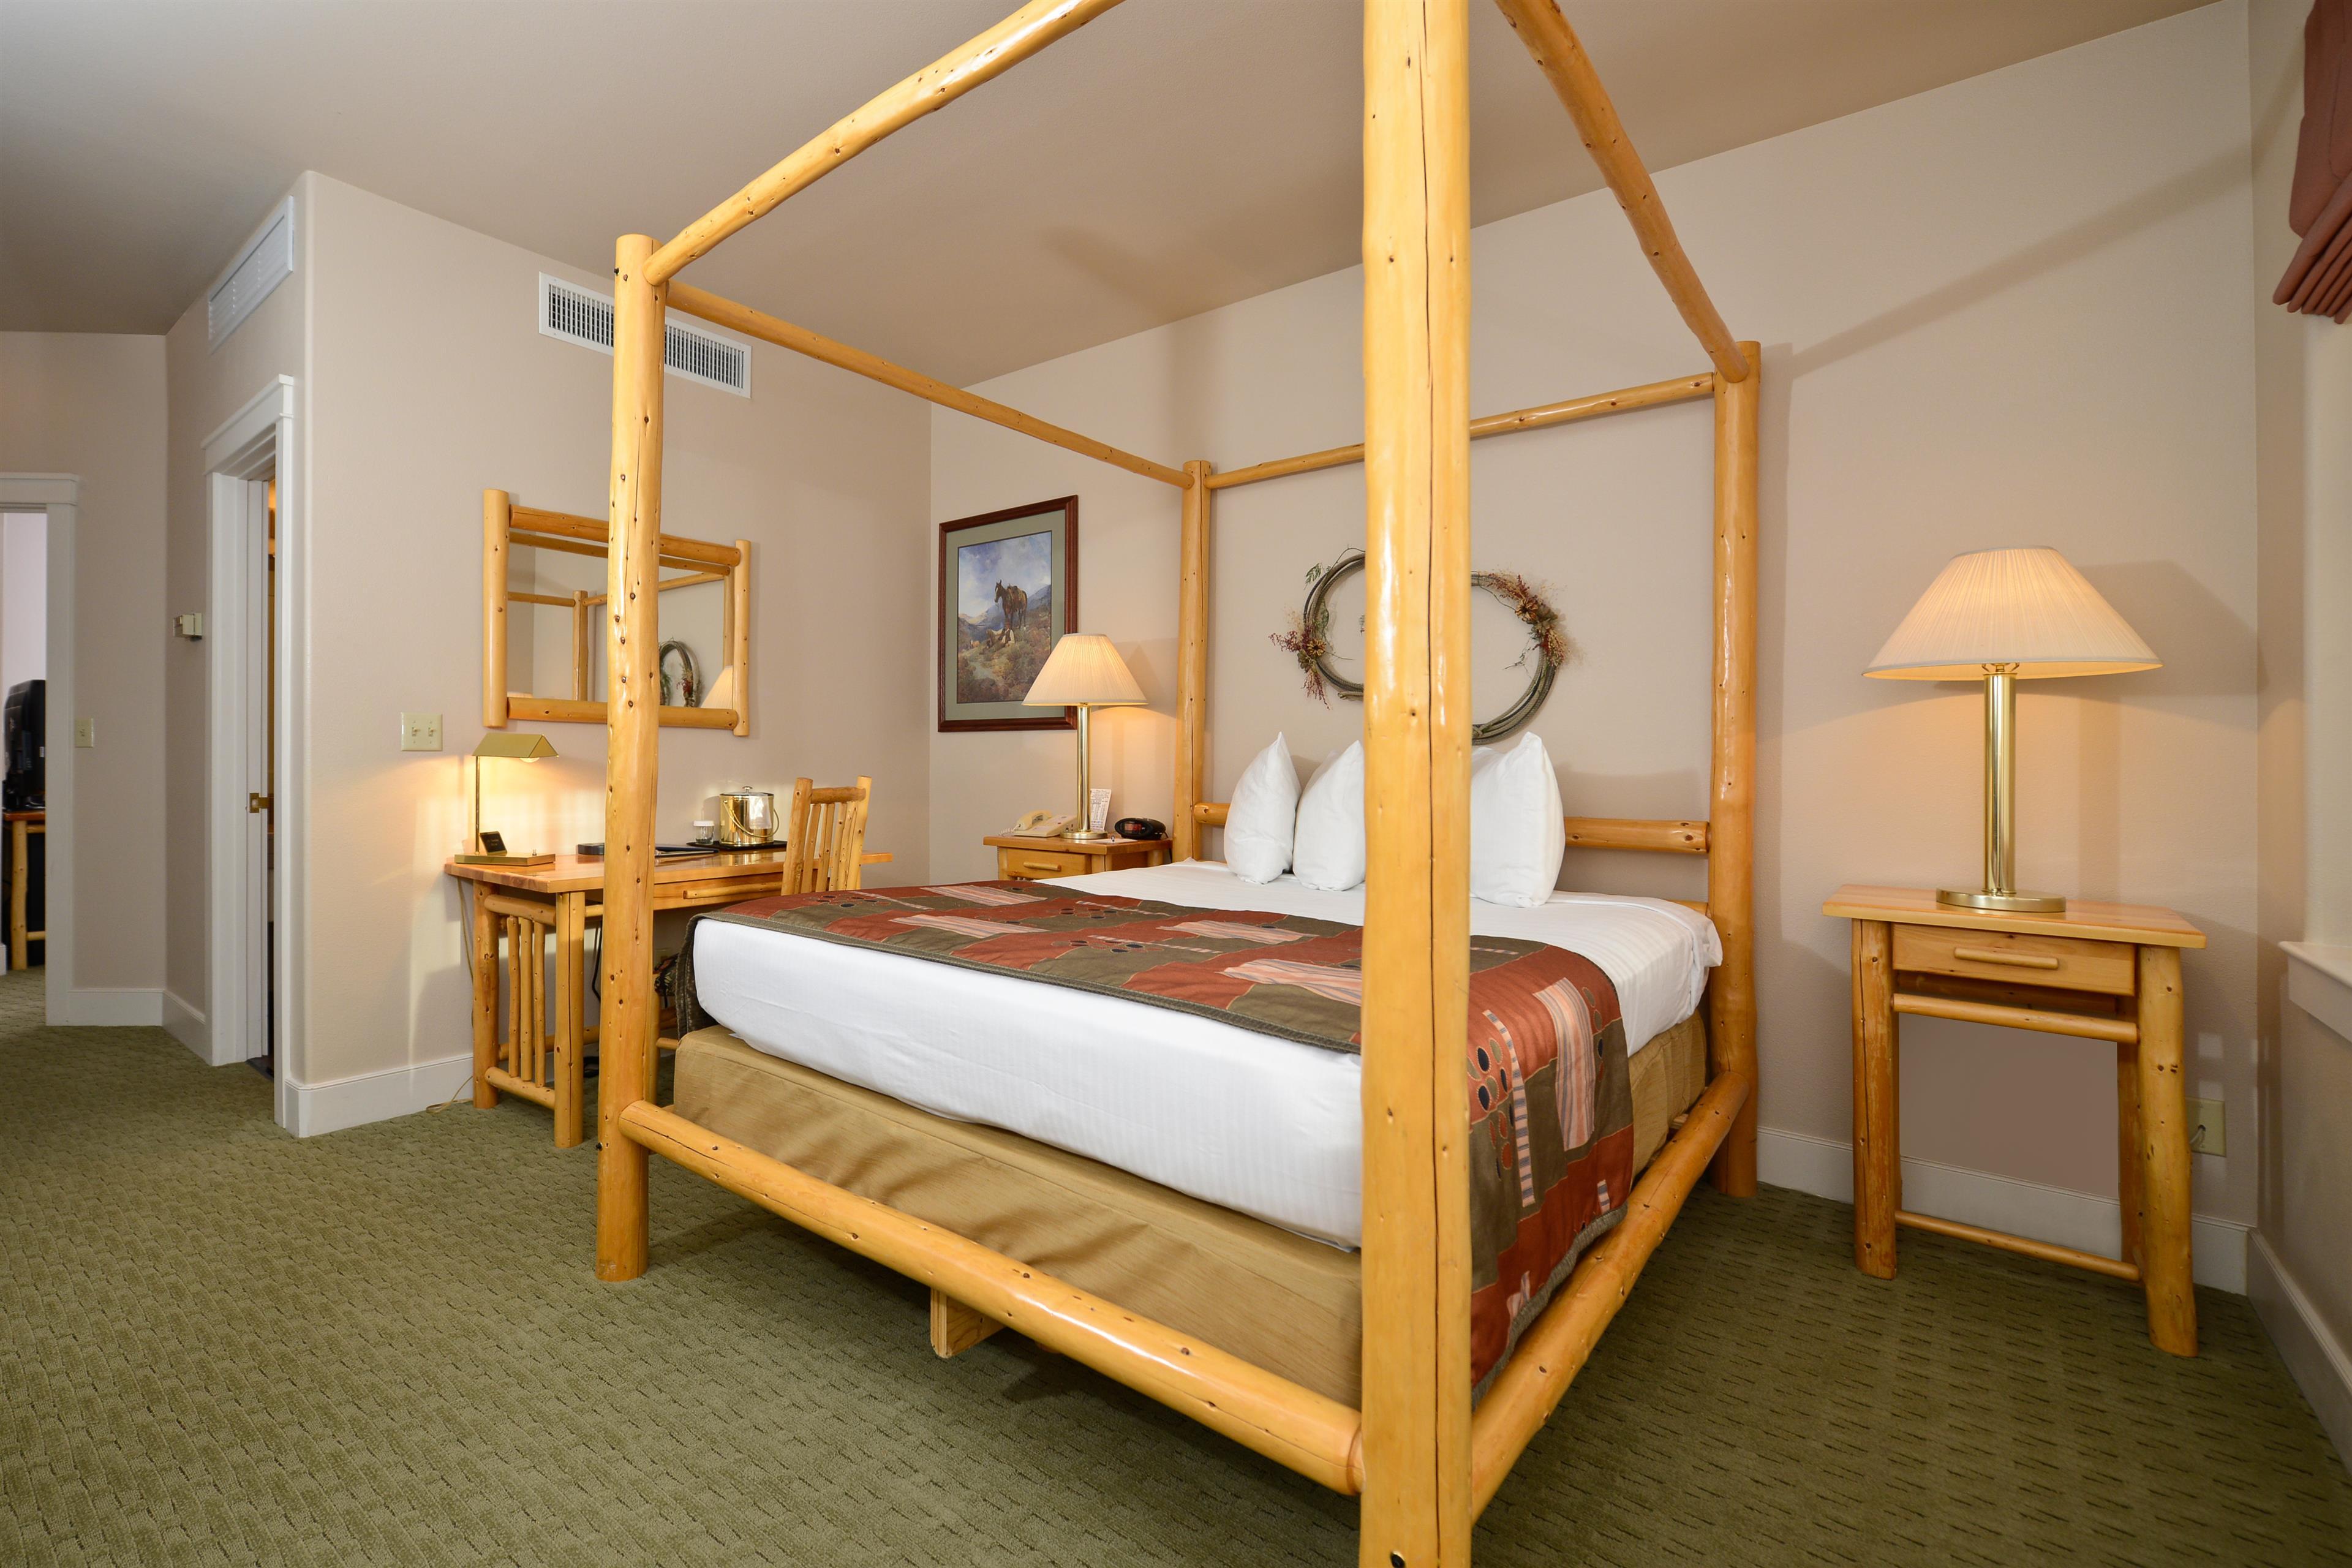 Best Western Plus Plaza Hotel image 25